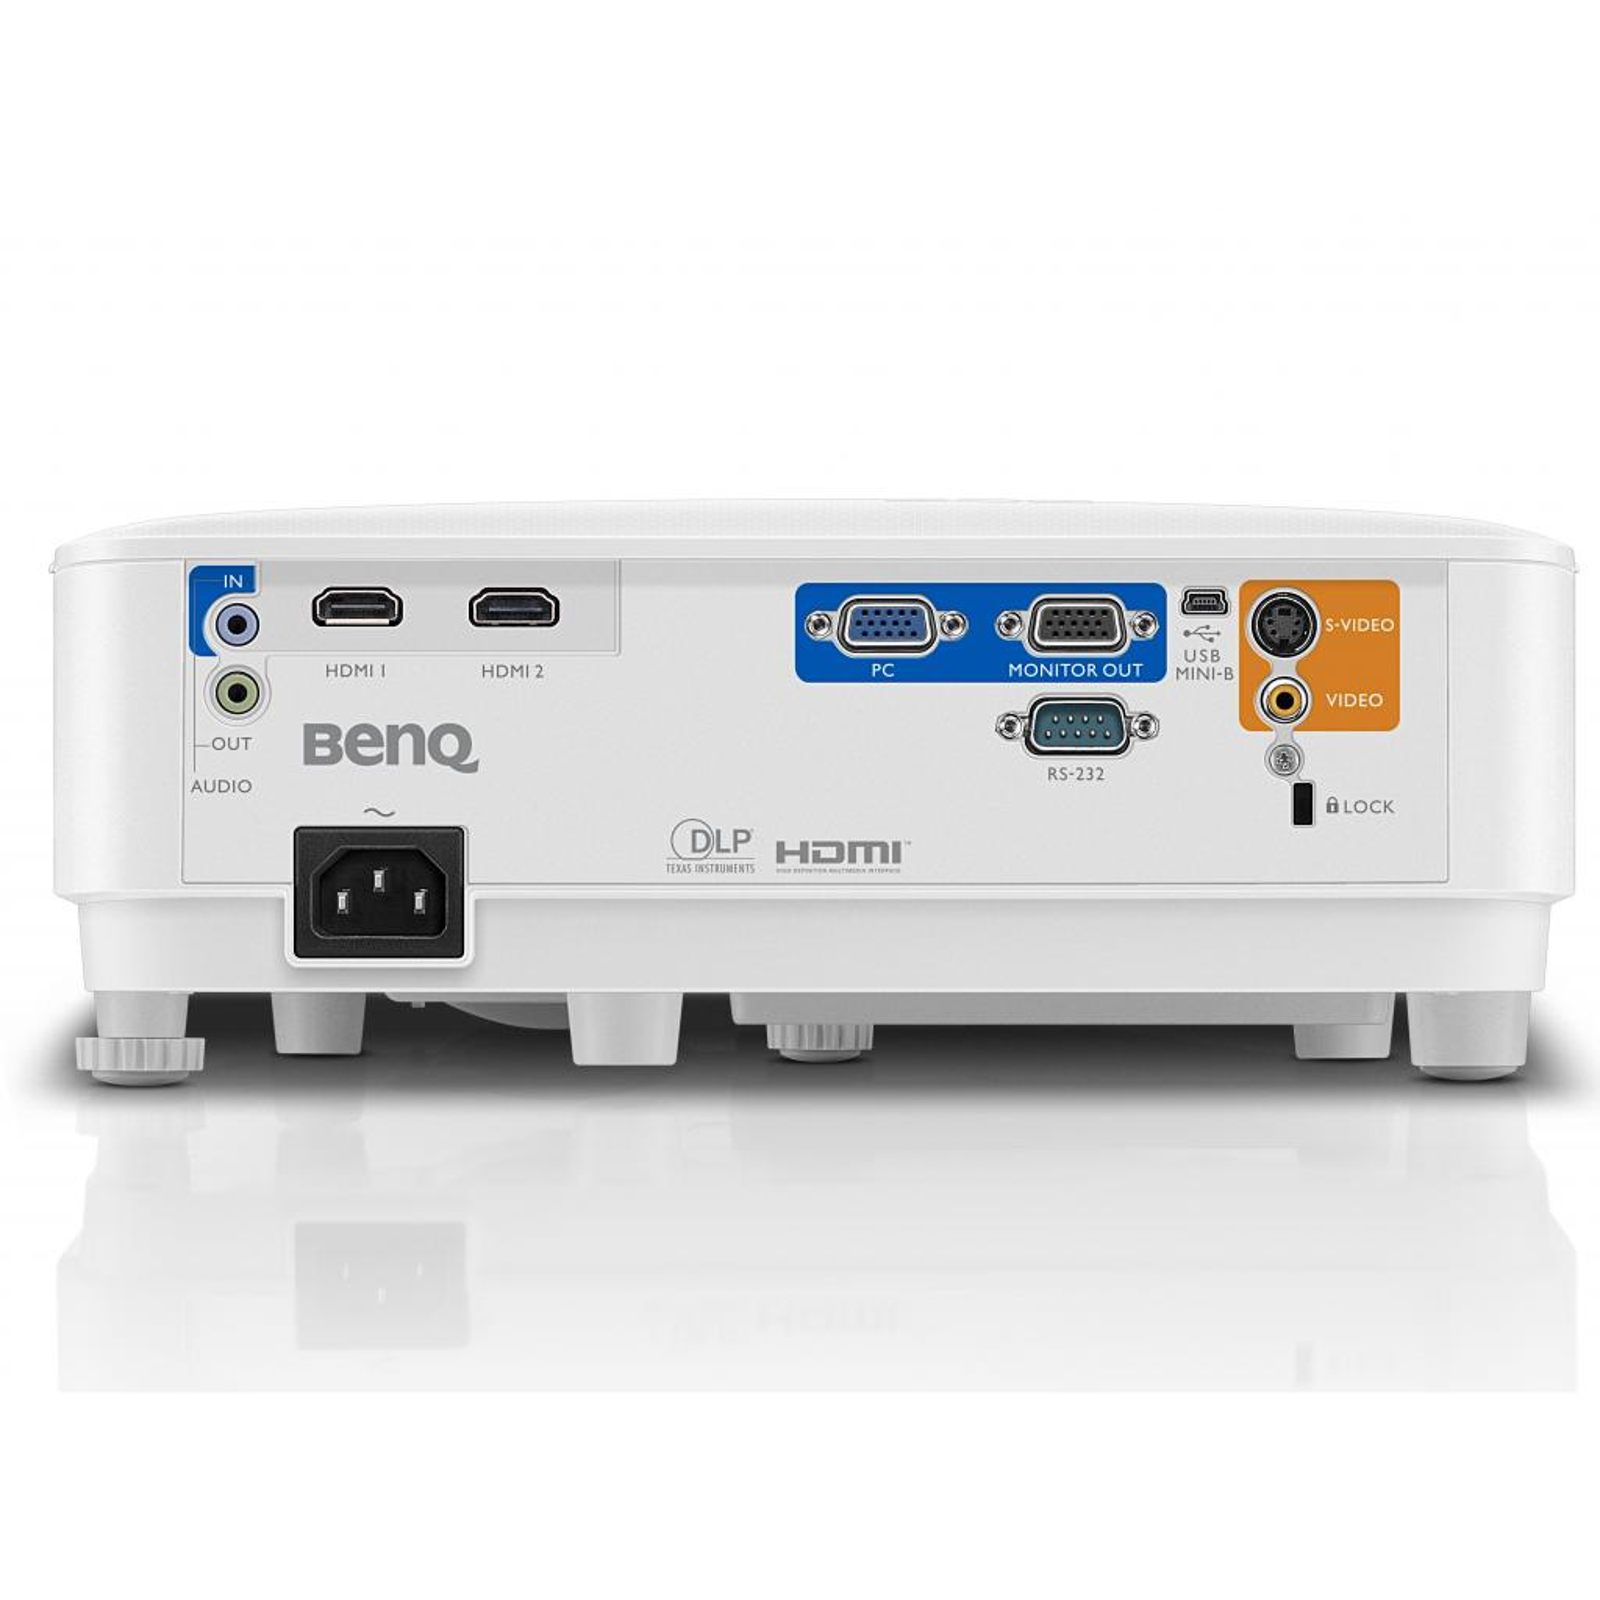 Проектор BenQ MW550 (9H.JHT77.13E) изображение 3